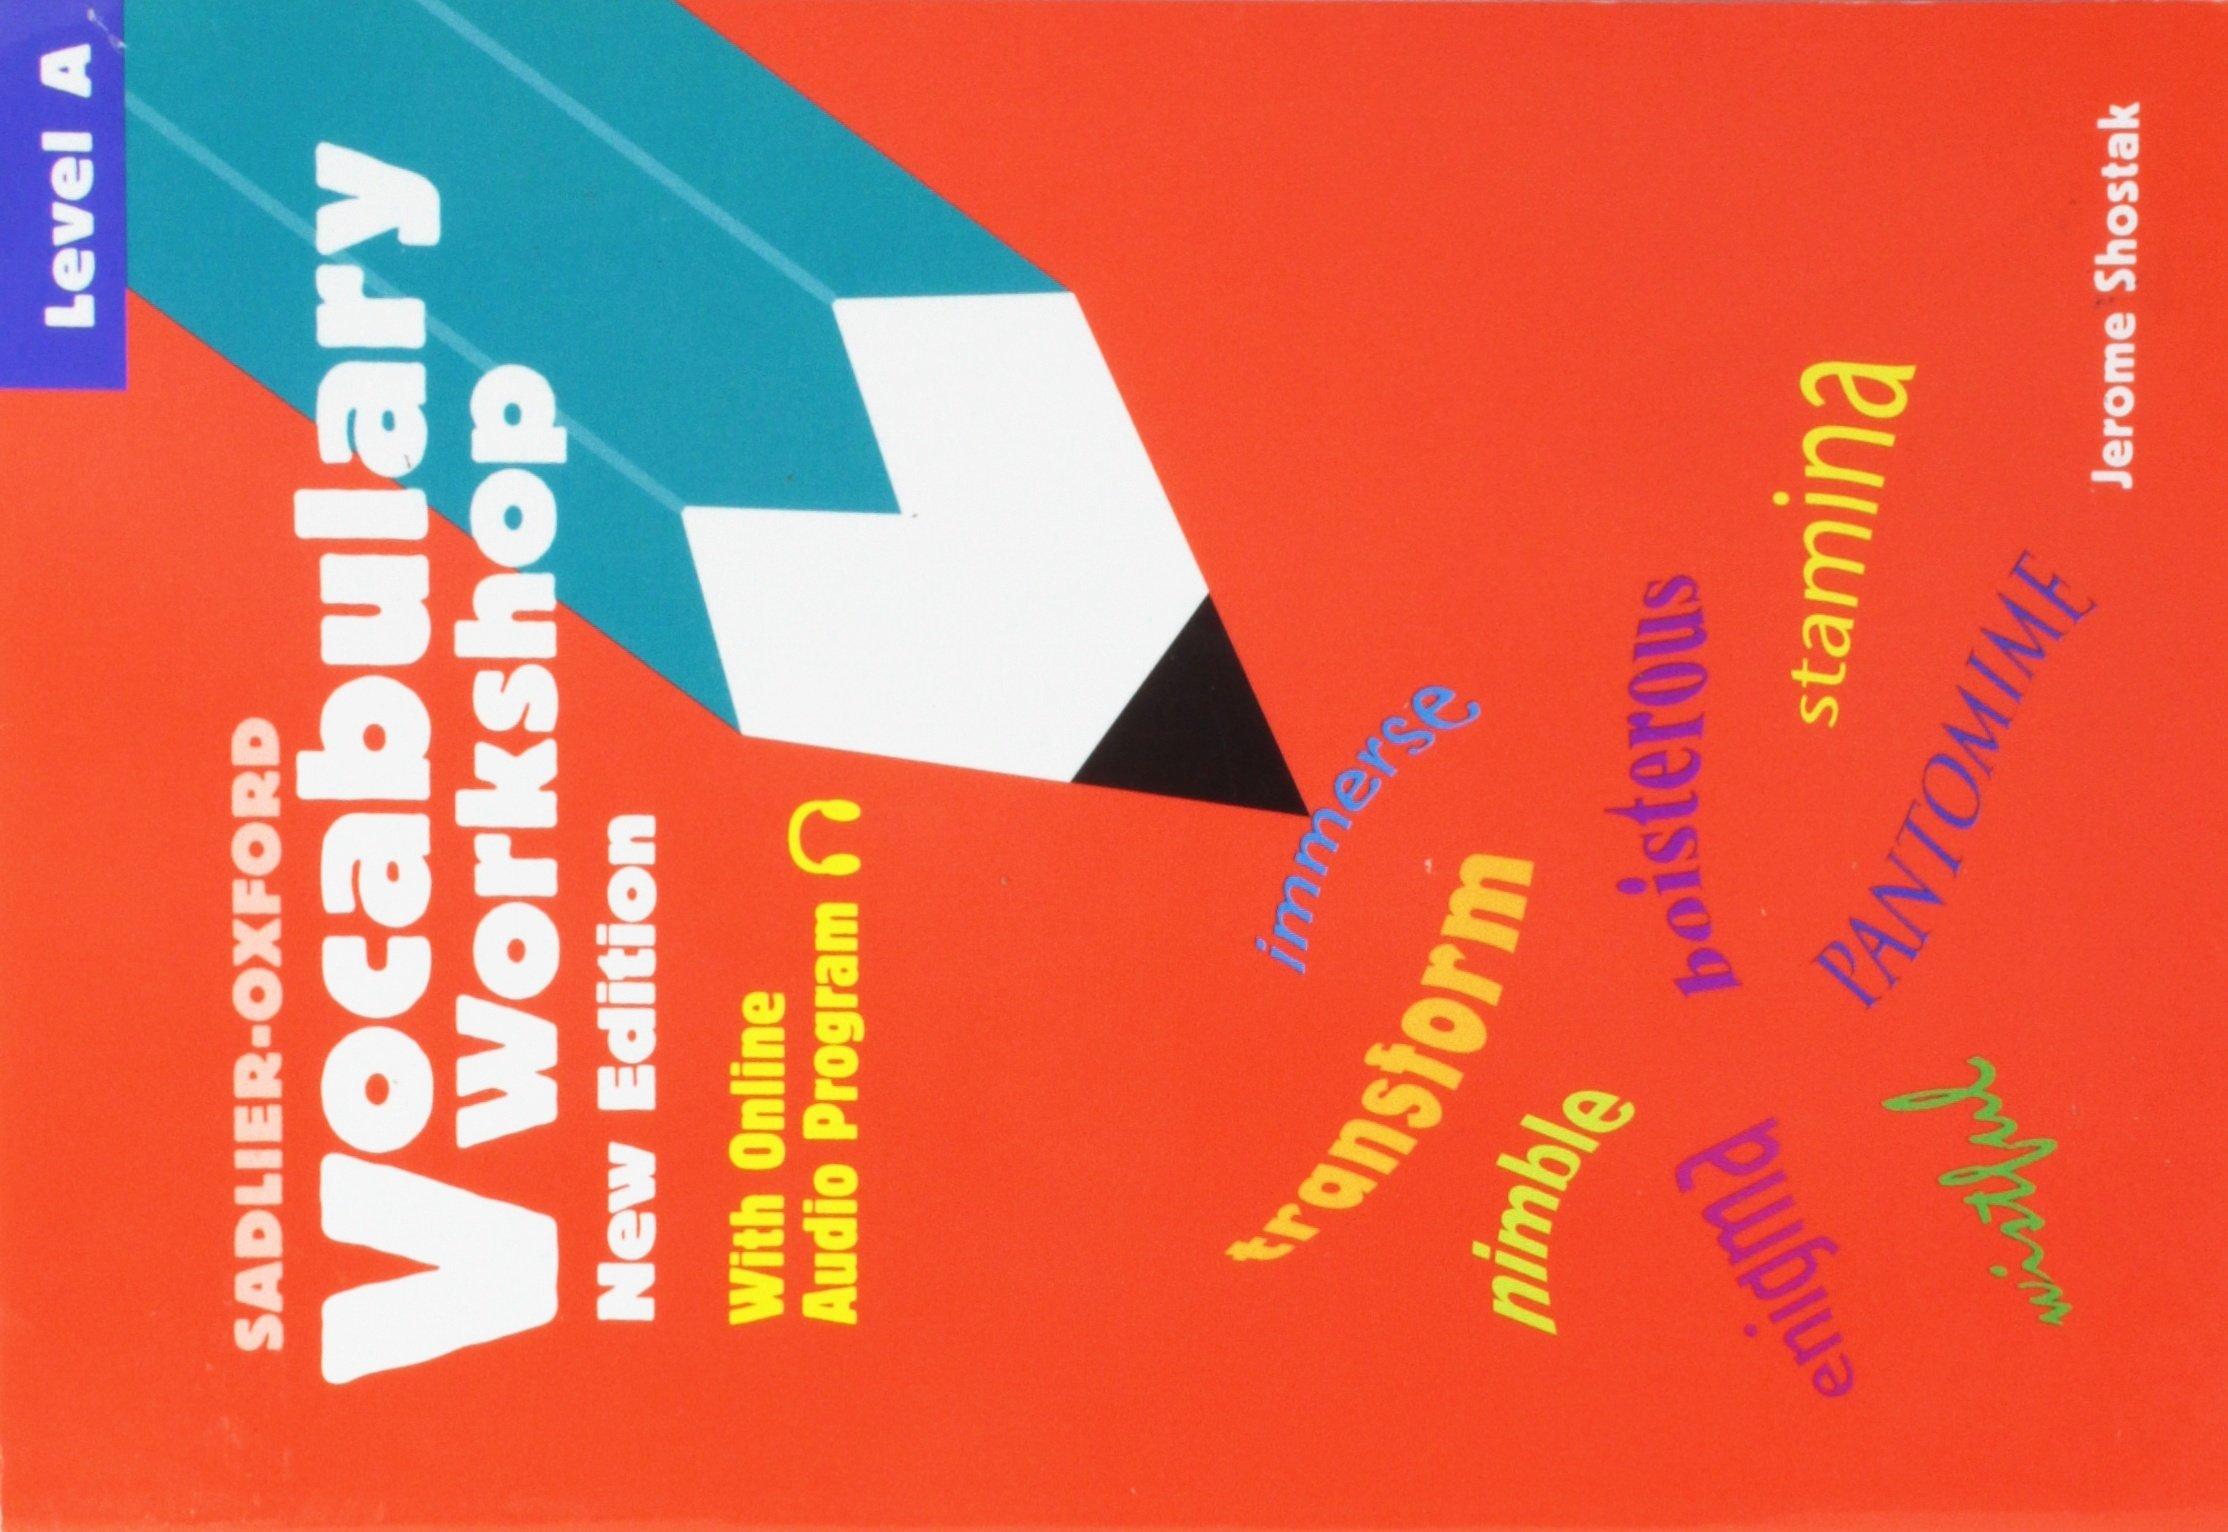 Sadlier-Oxford Vocabulary Workshop: Level A - New Edition